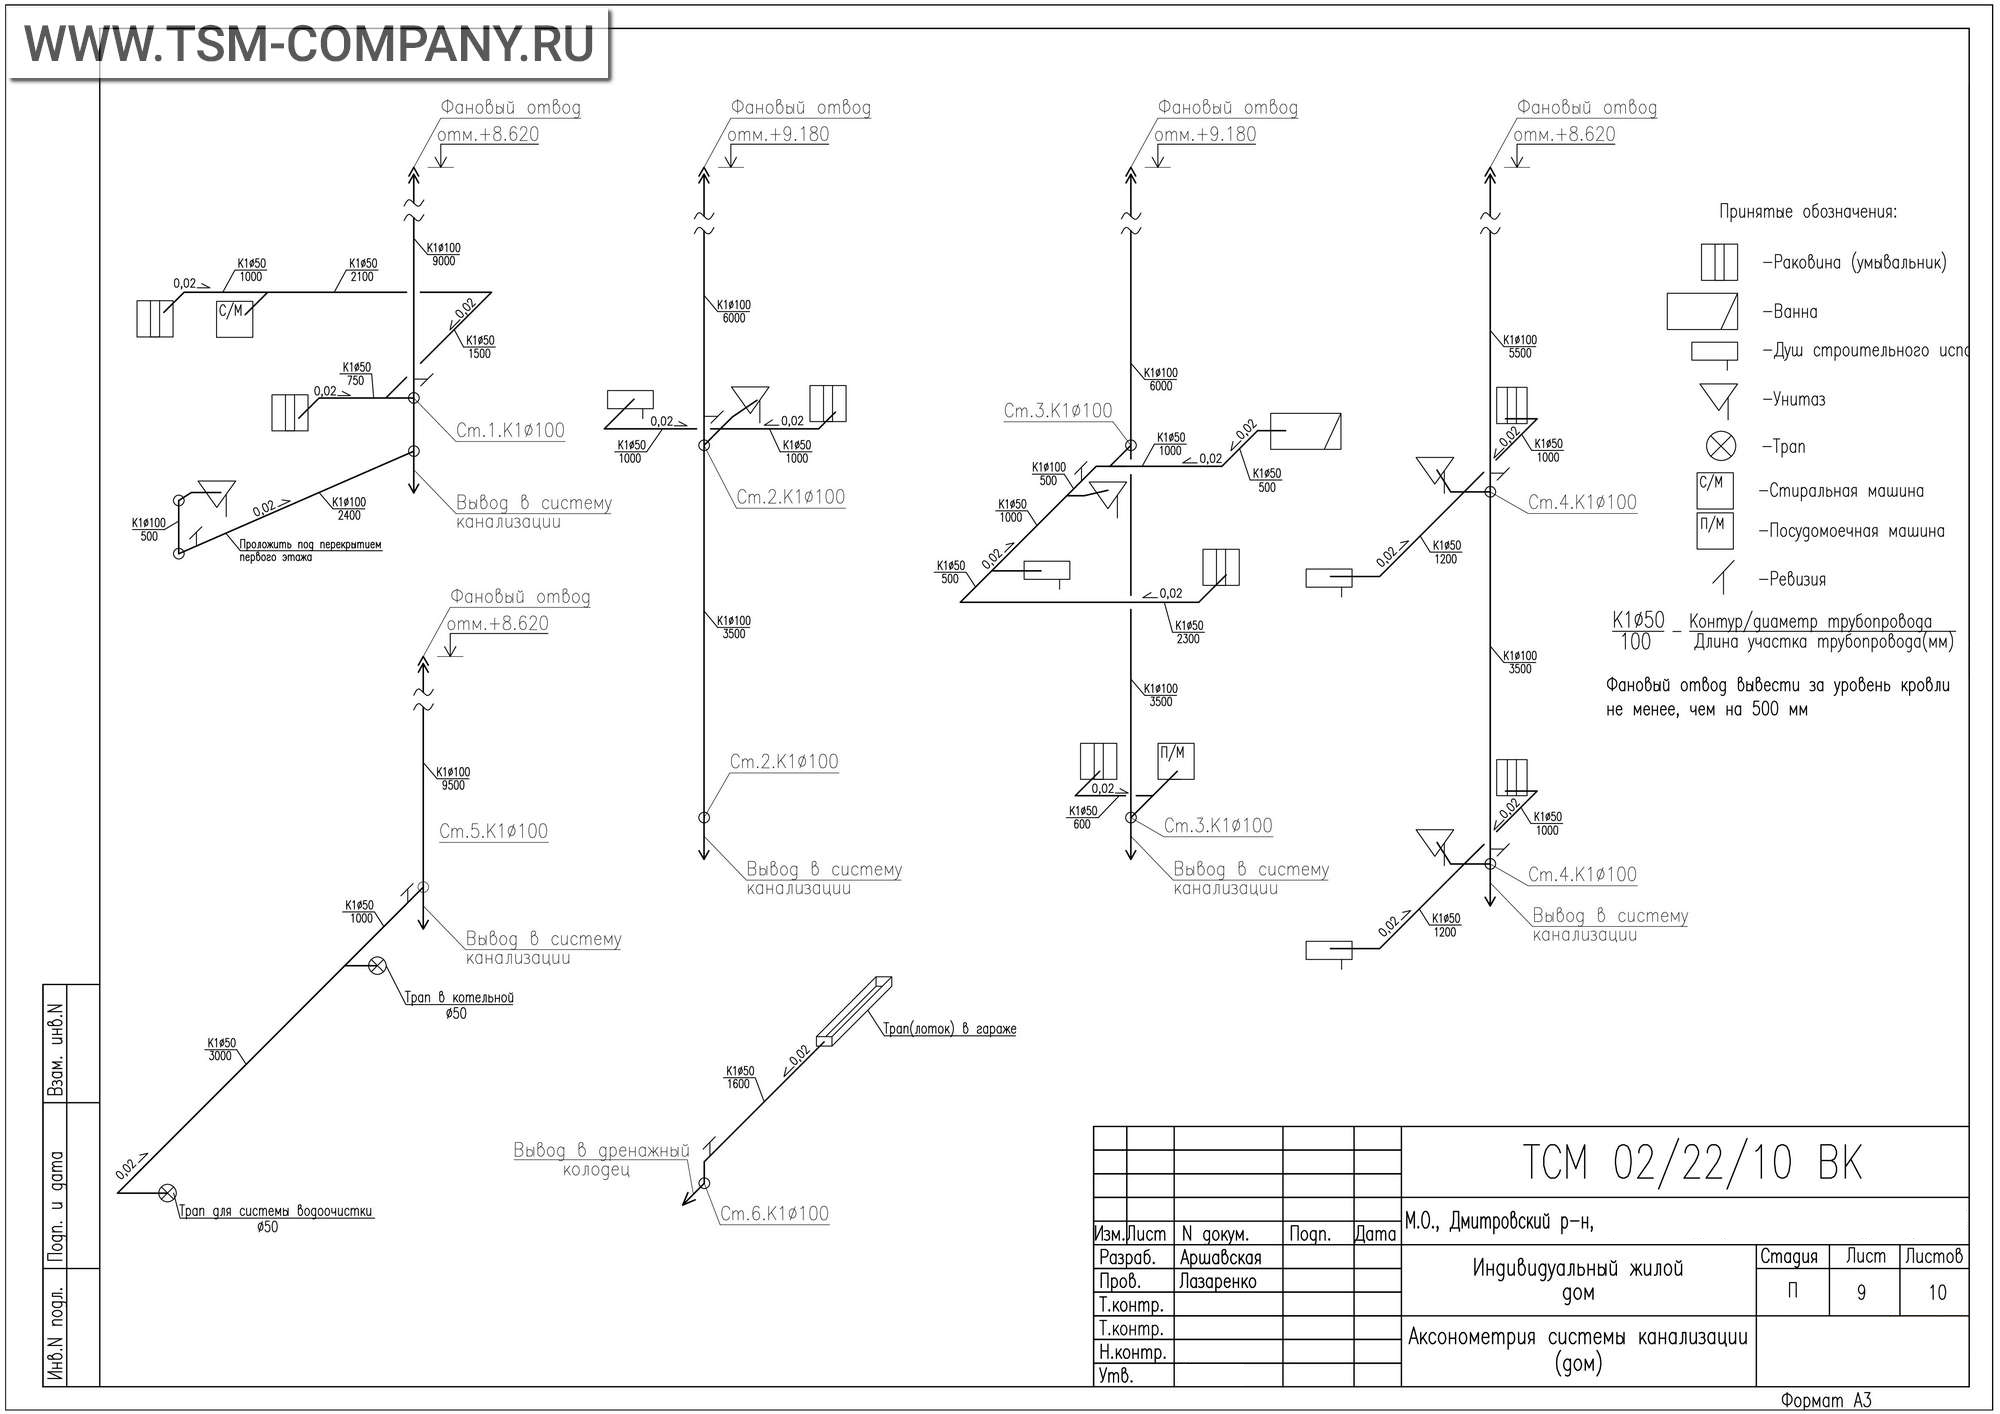 Гост на оформление отопление вентиляция и кондиционирование. аксонометрическая схема отопления и вентиляции